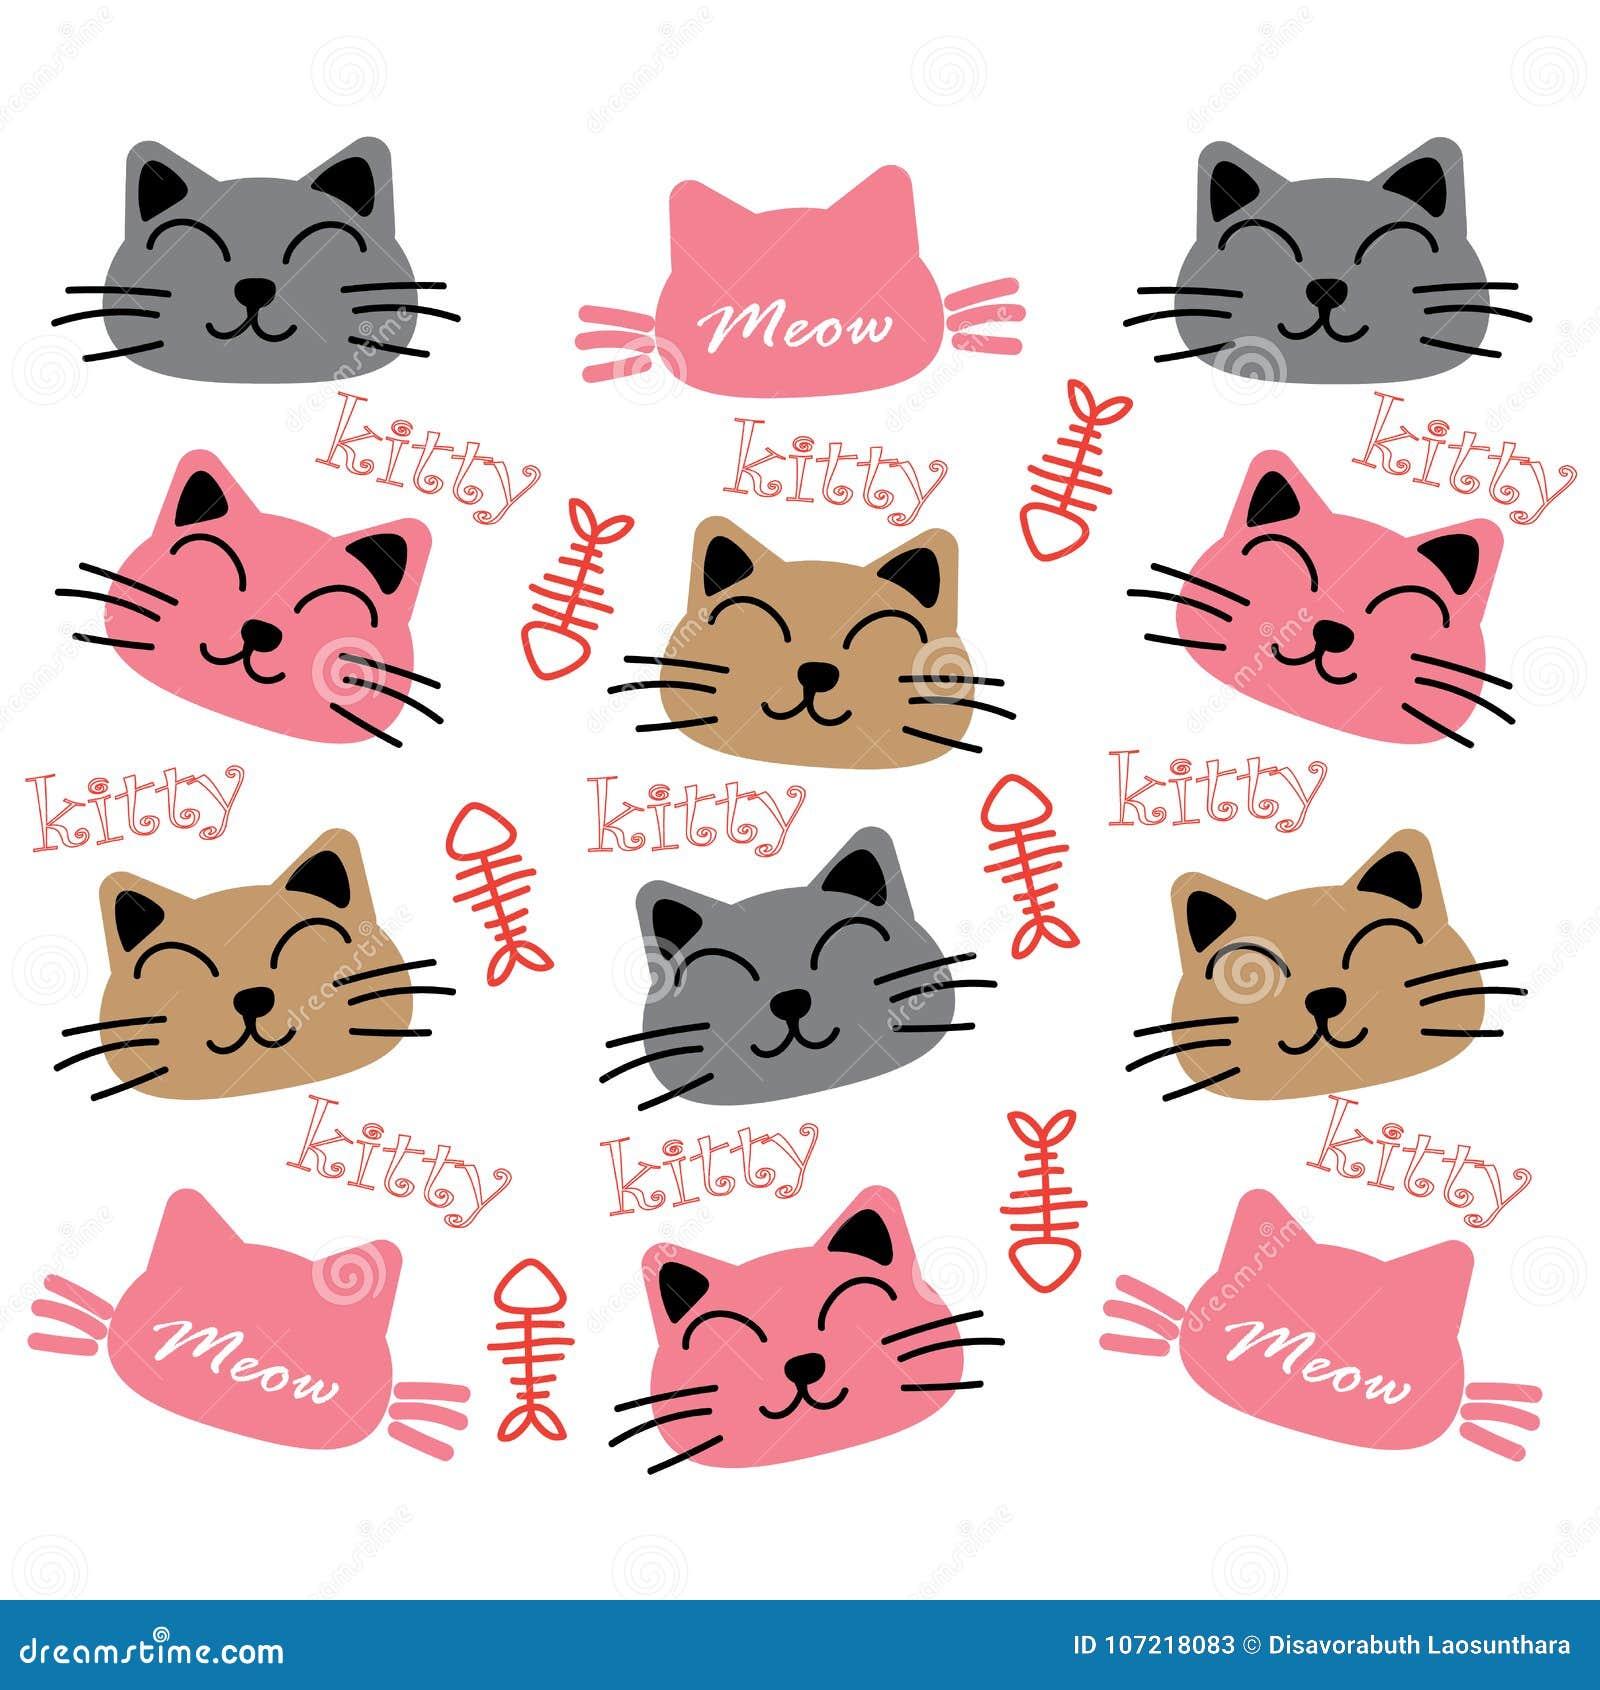 Cat Wallpaper Background Stock Vector Illustration Of Kitty